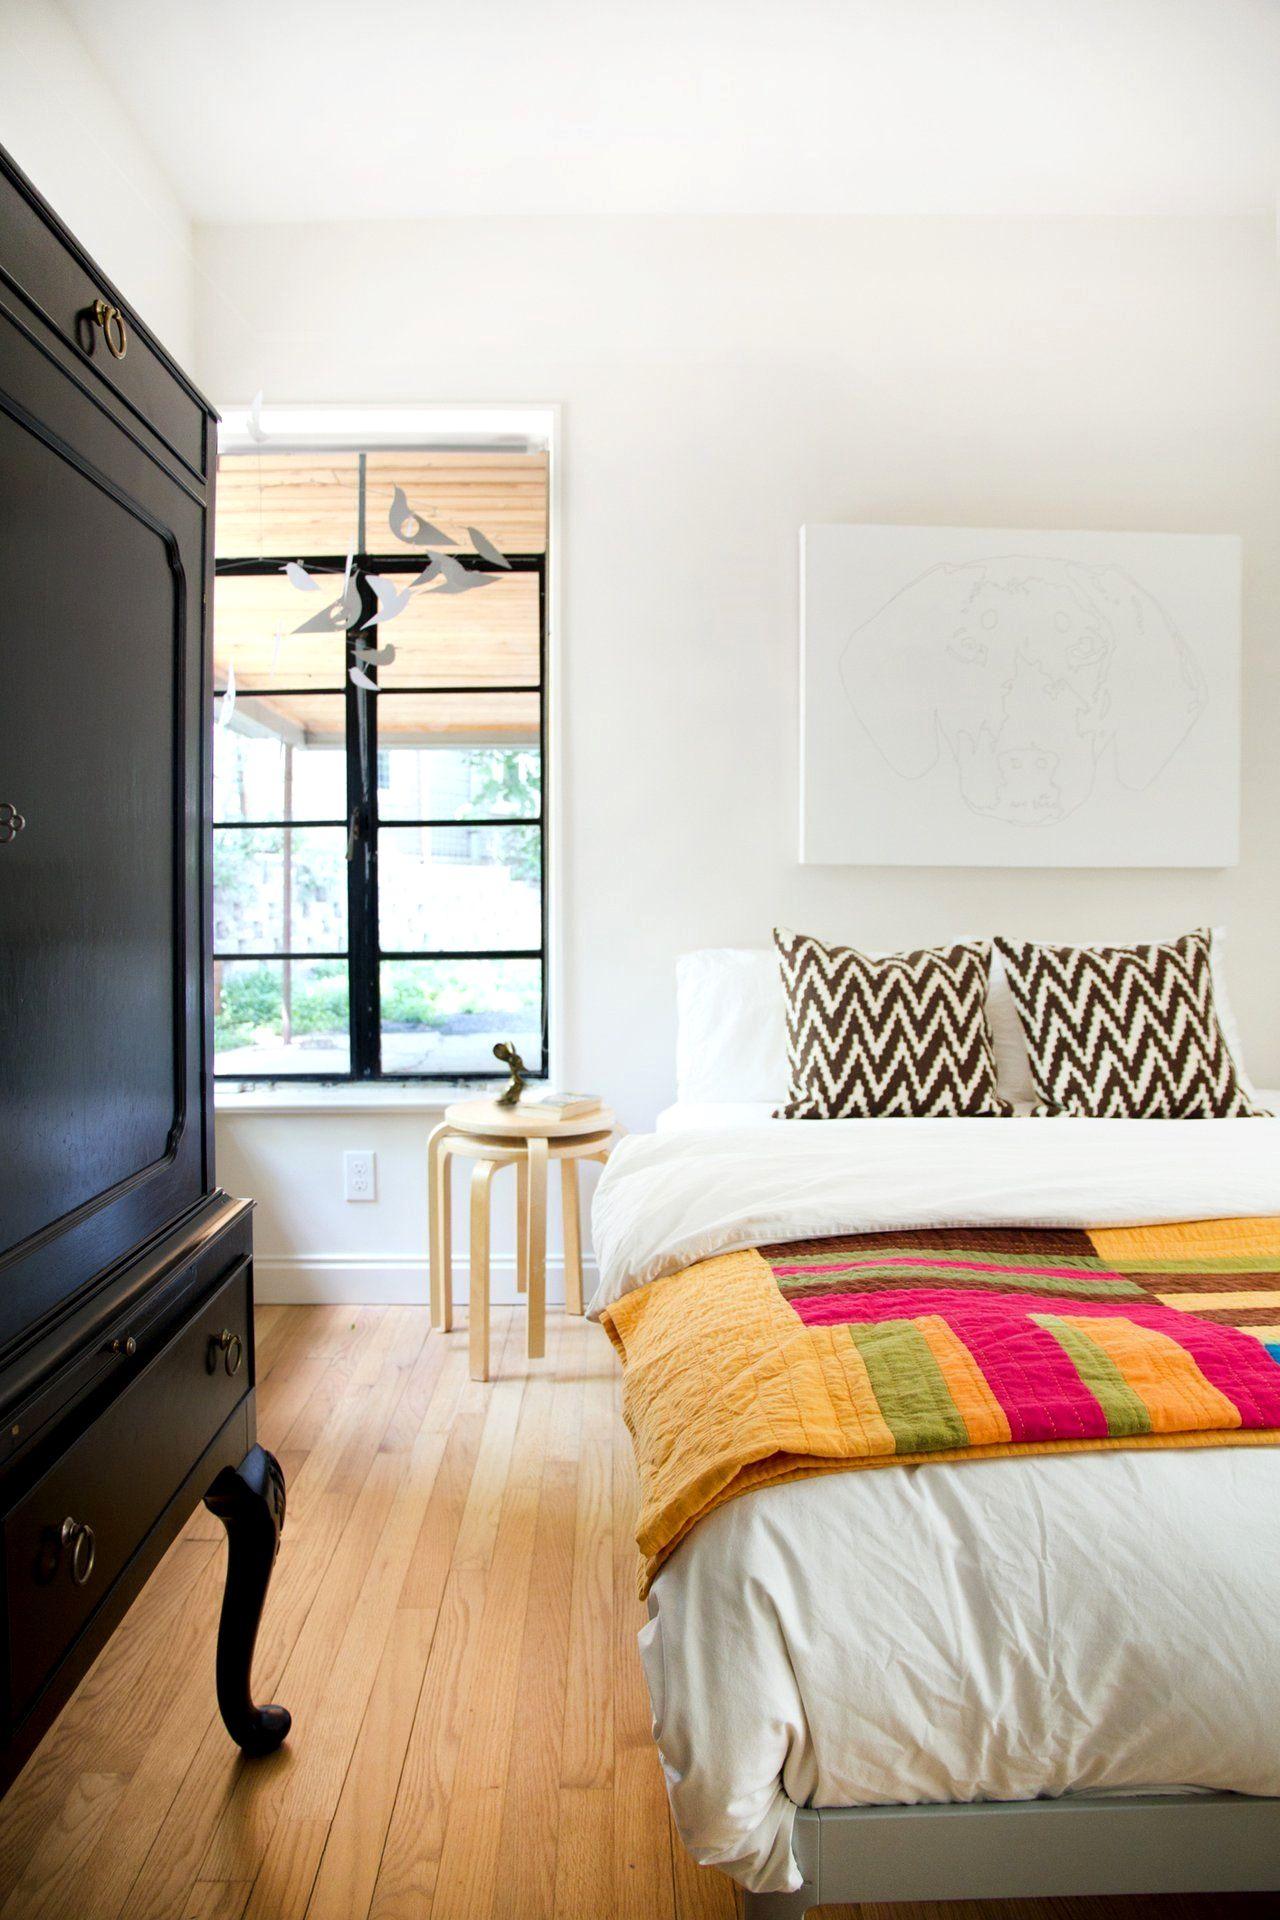 23 Minimalist Bedroom Decorating Ideas in 2020 Home